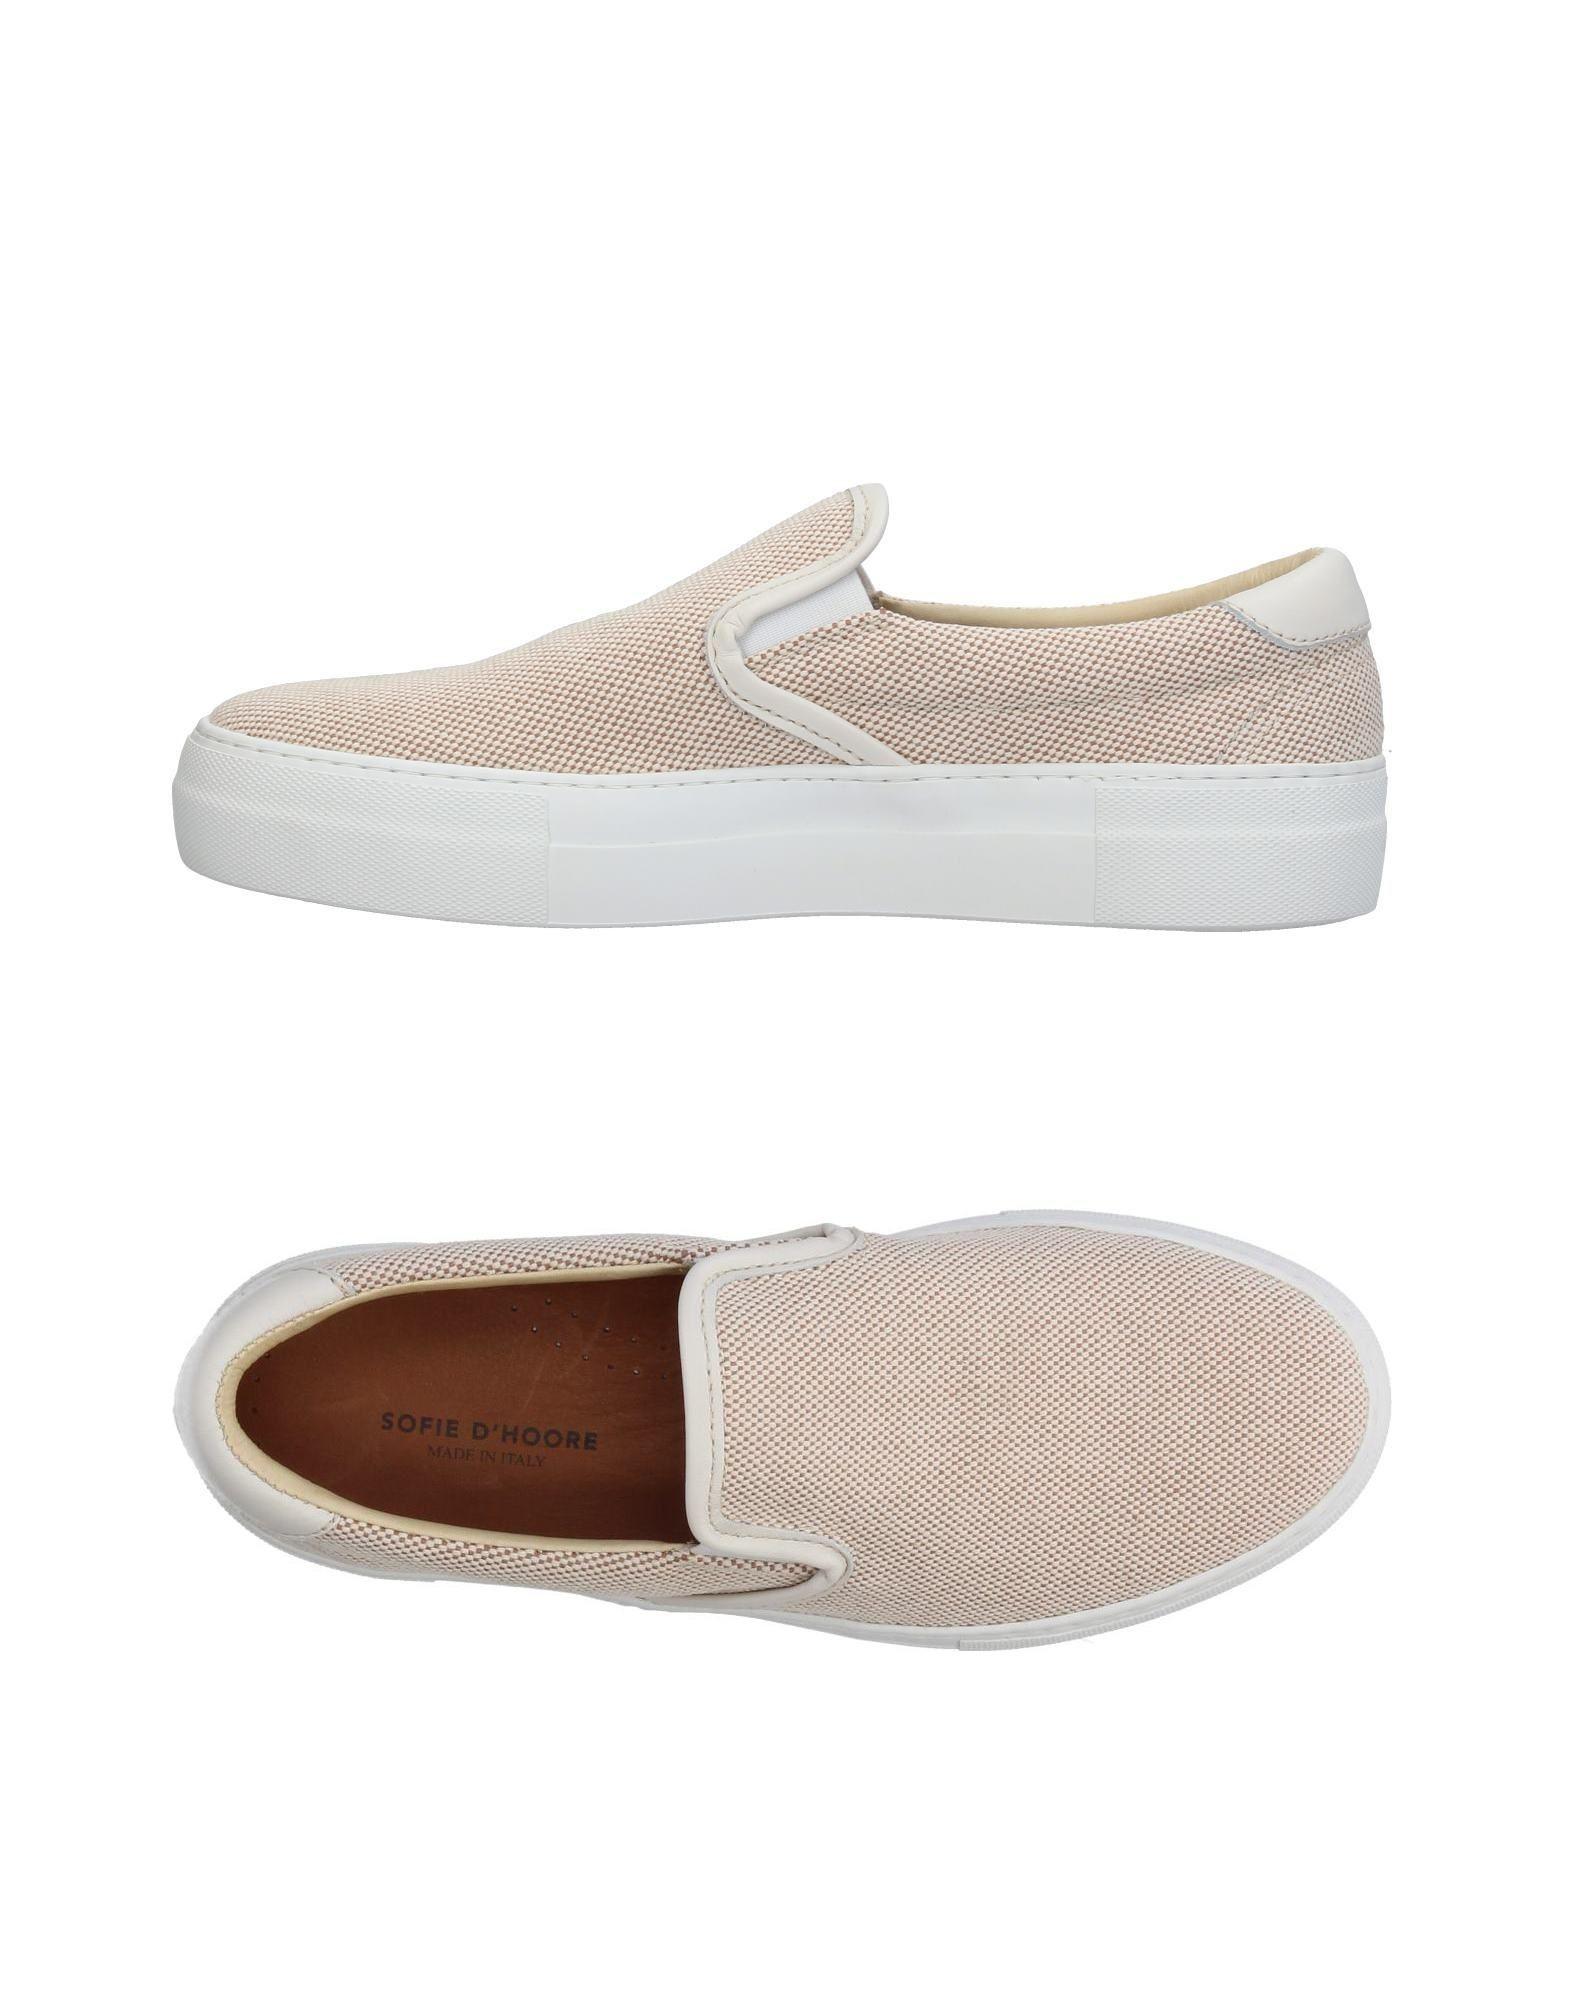 Sofie D'hoore Sneakers Damen  11397194PM Gute Qualität beliebte Schuhe